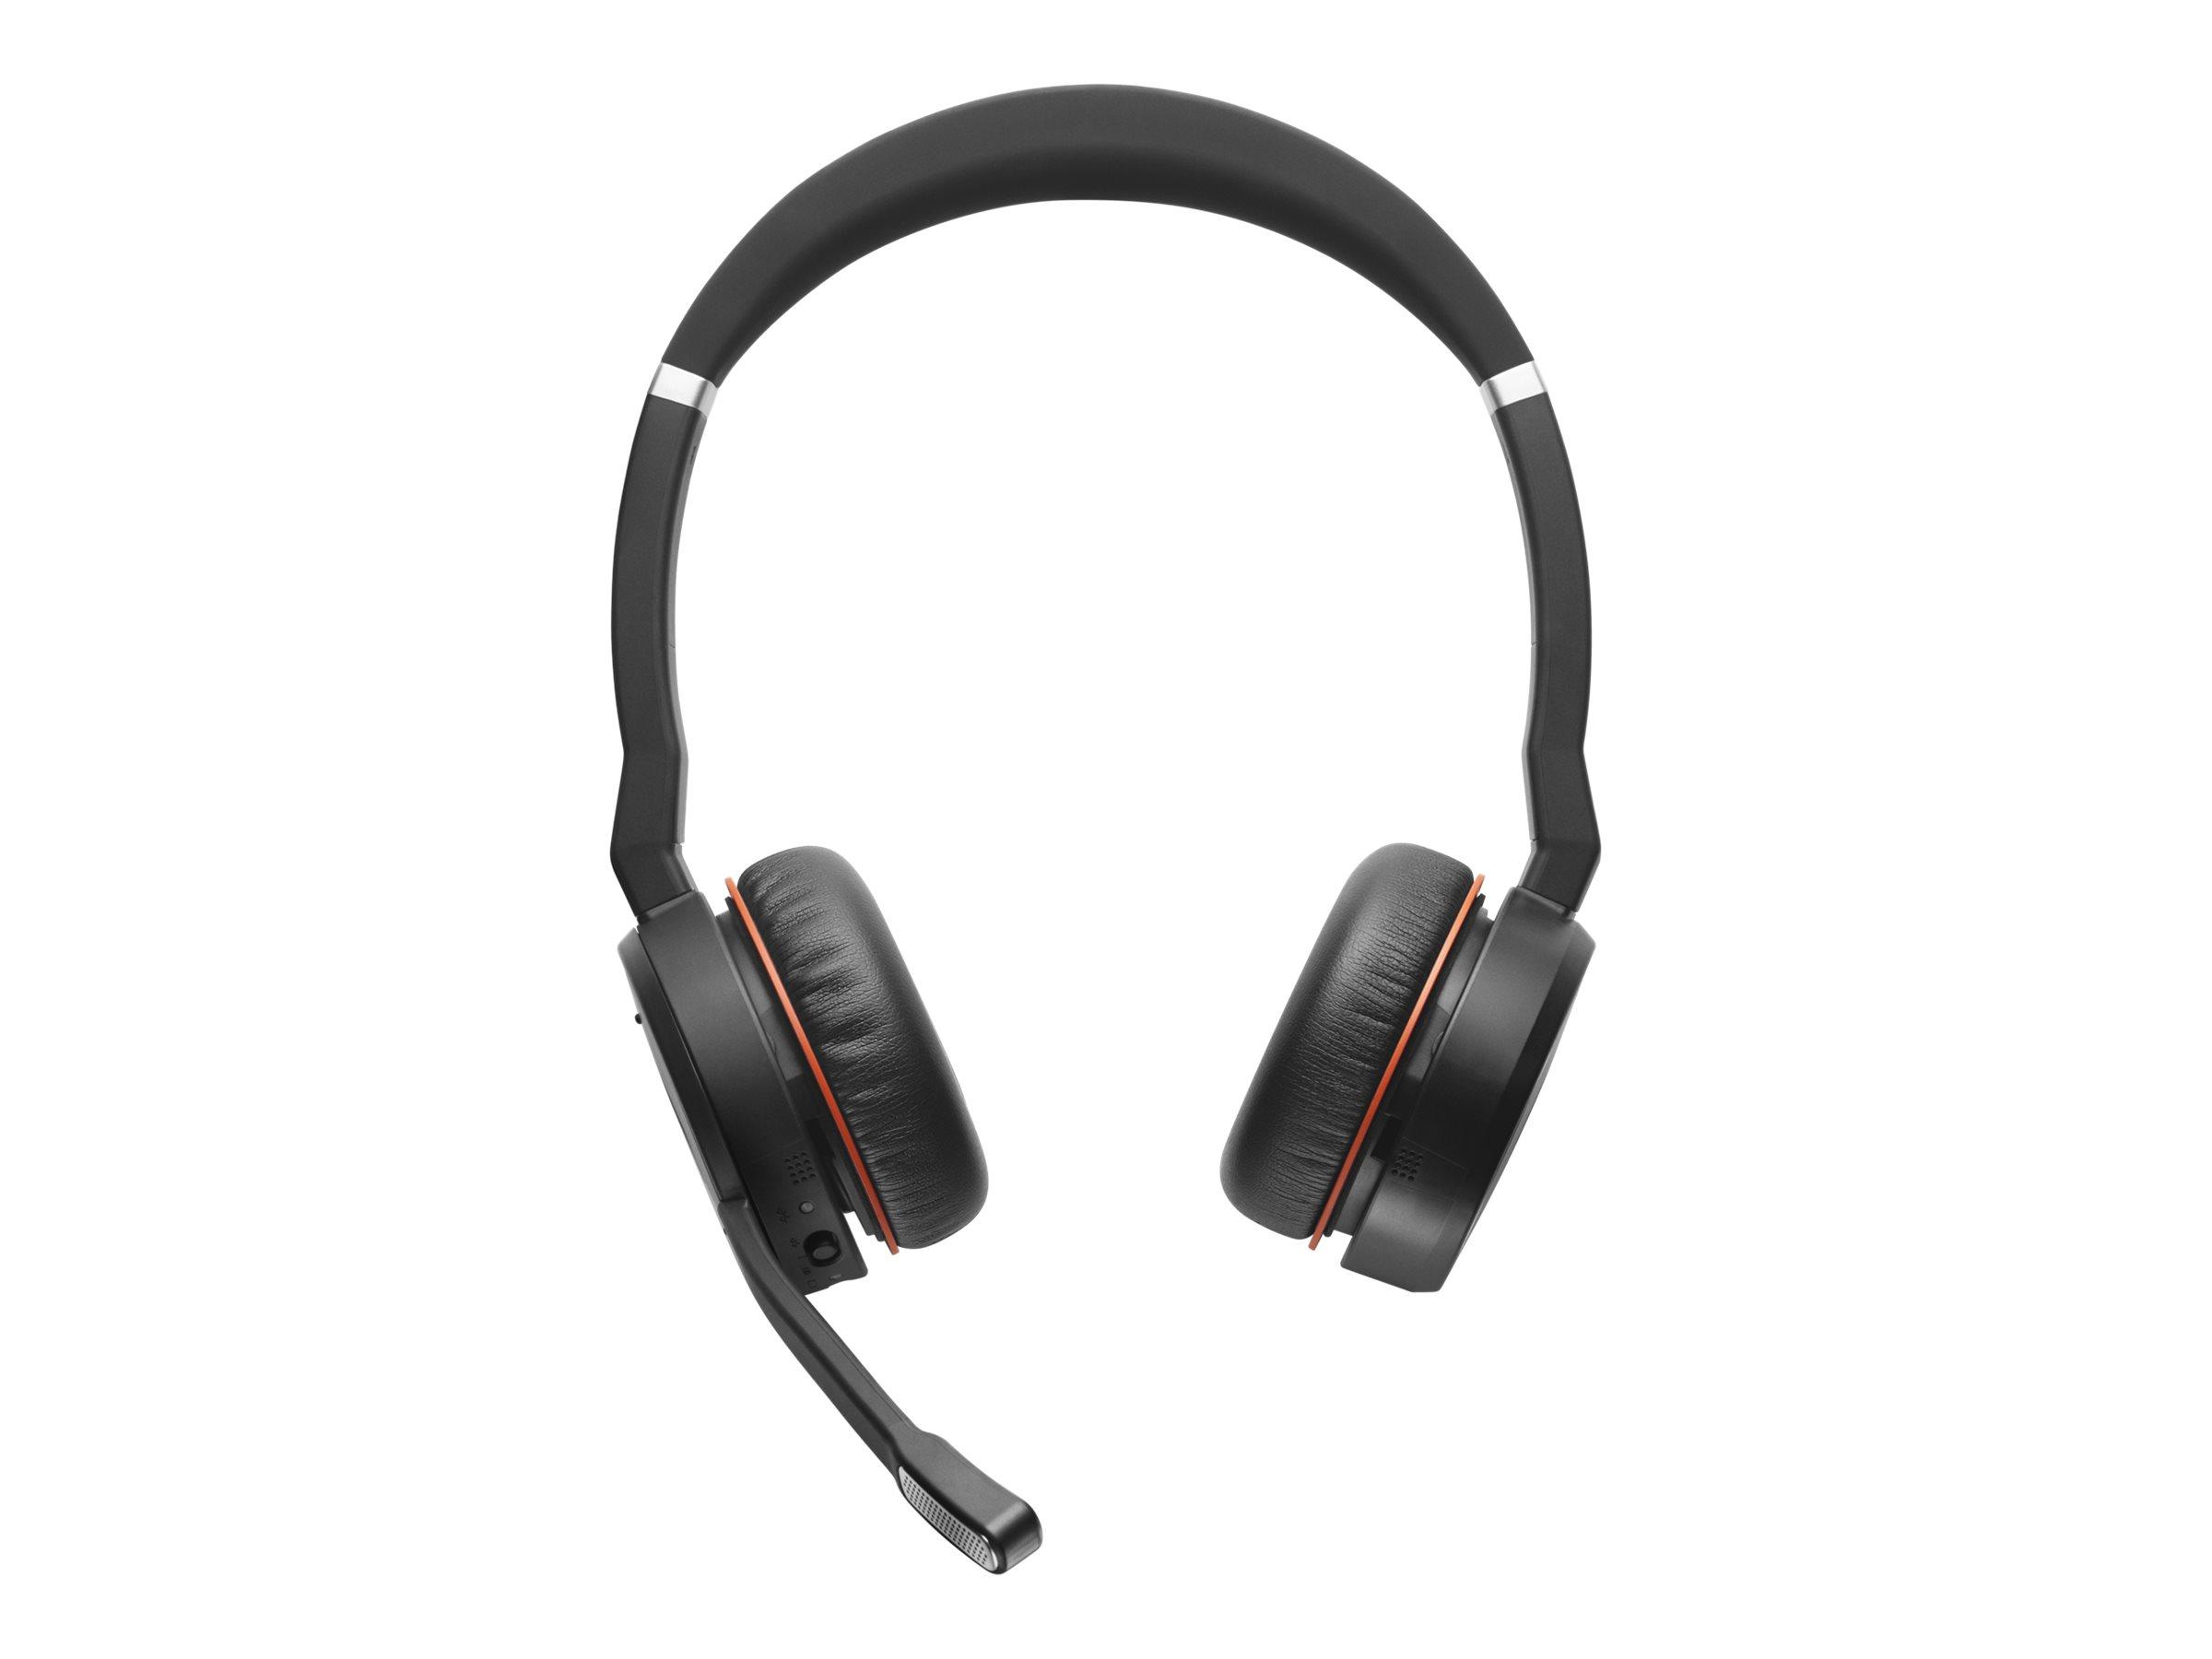 Jabra Evolve 75 MS Stereo - Headset - On-Ear - Bluetooth - kabellos - aktive Rauschunterdrückung